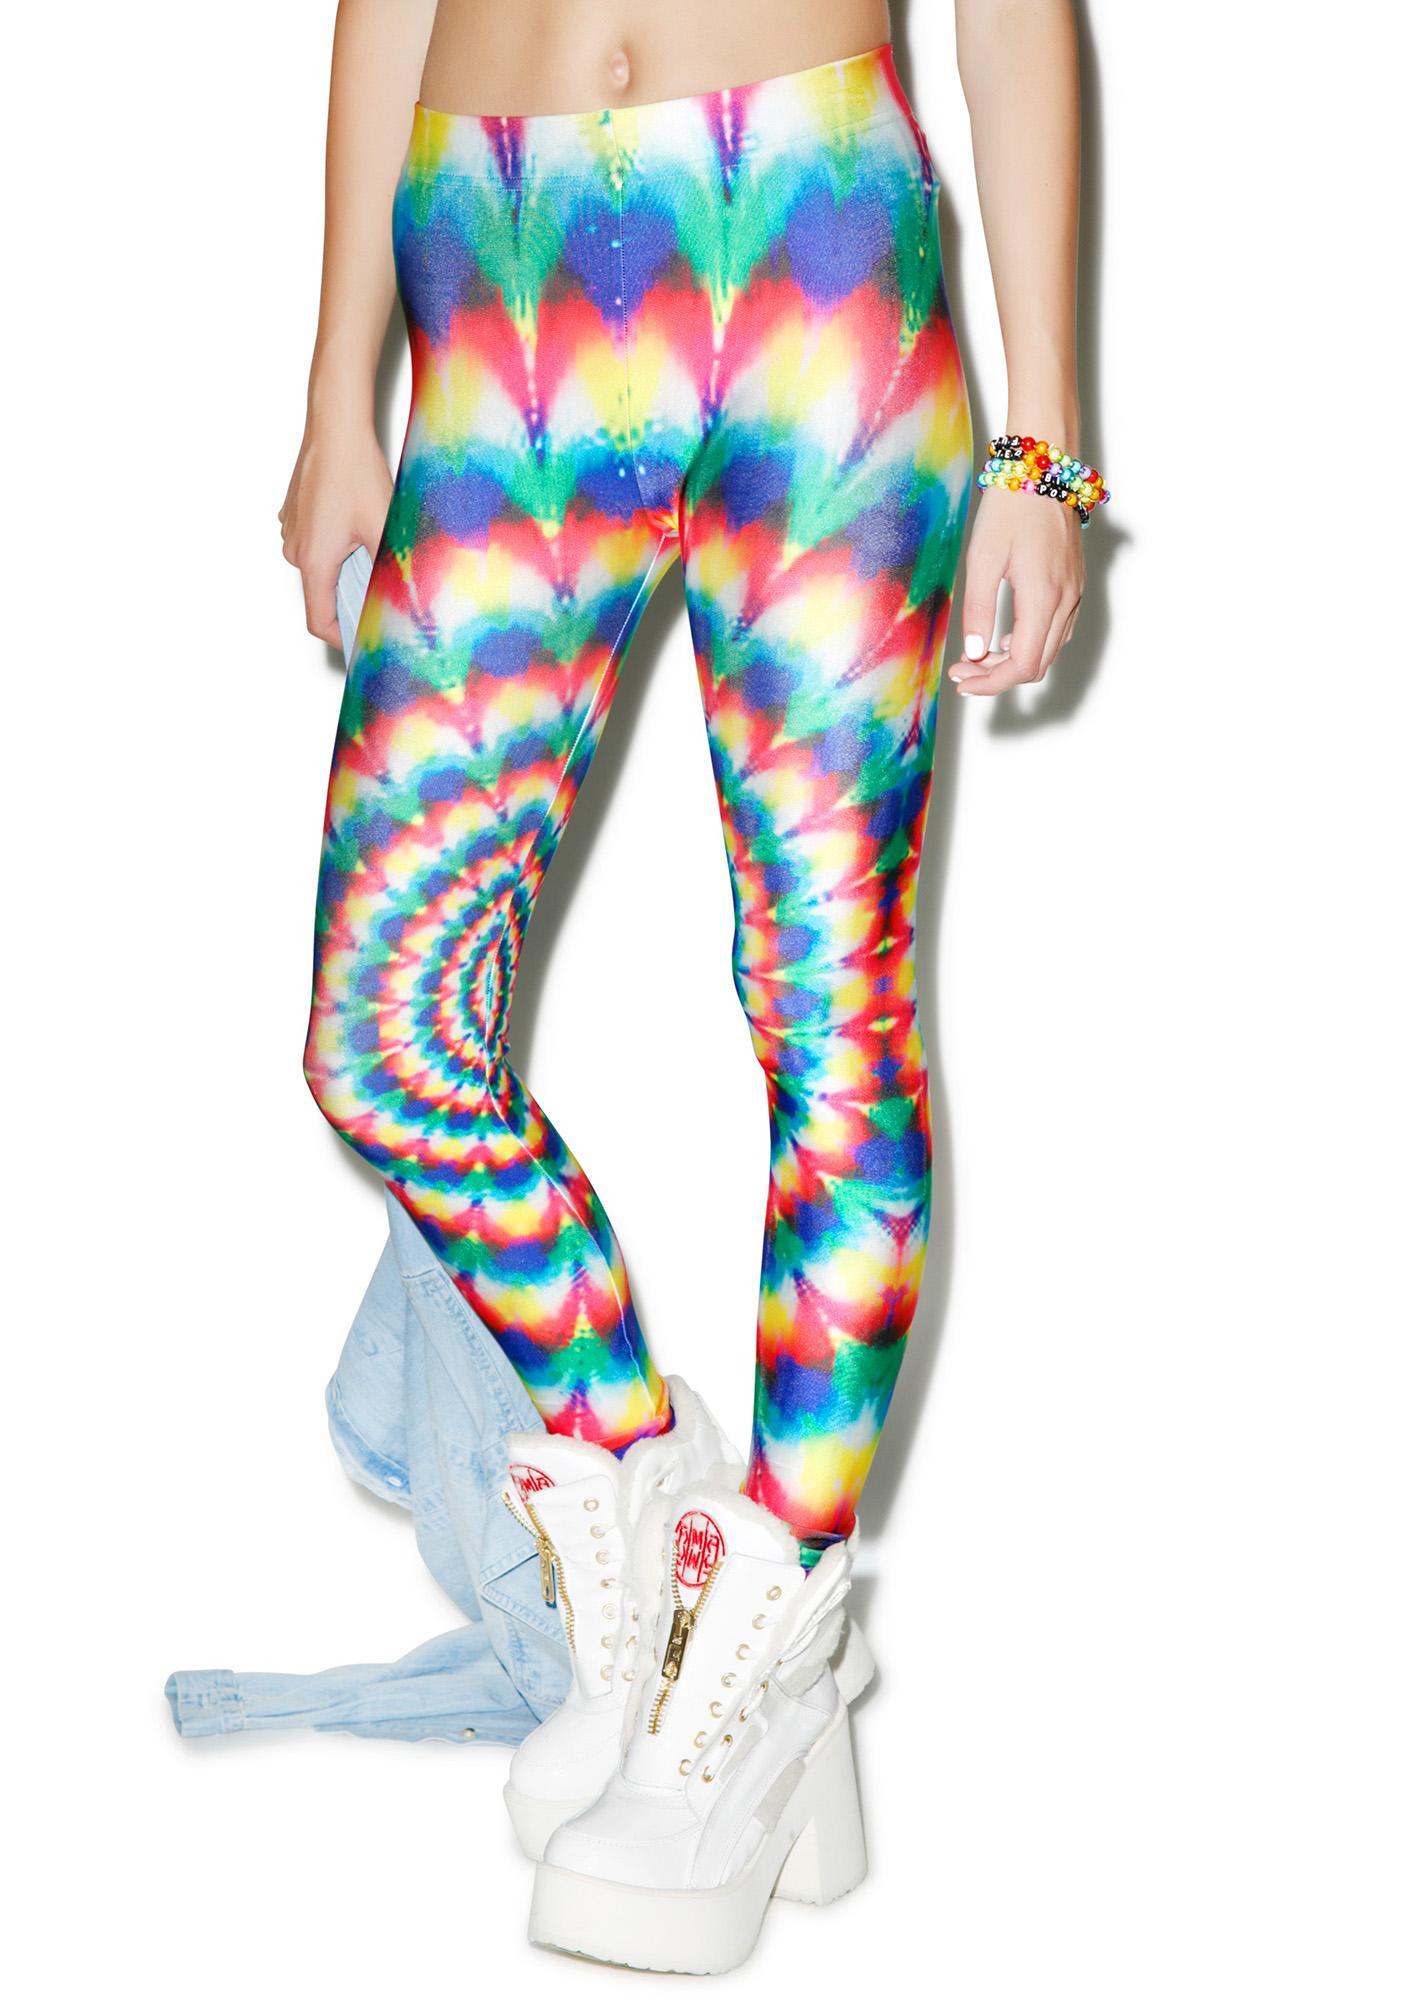 Into The Rainbow Leggings